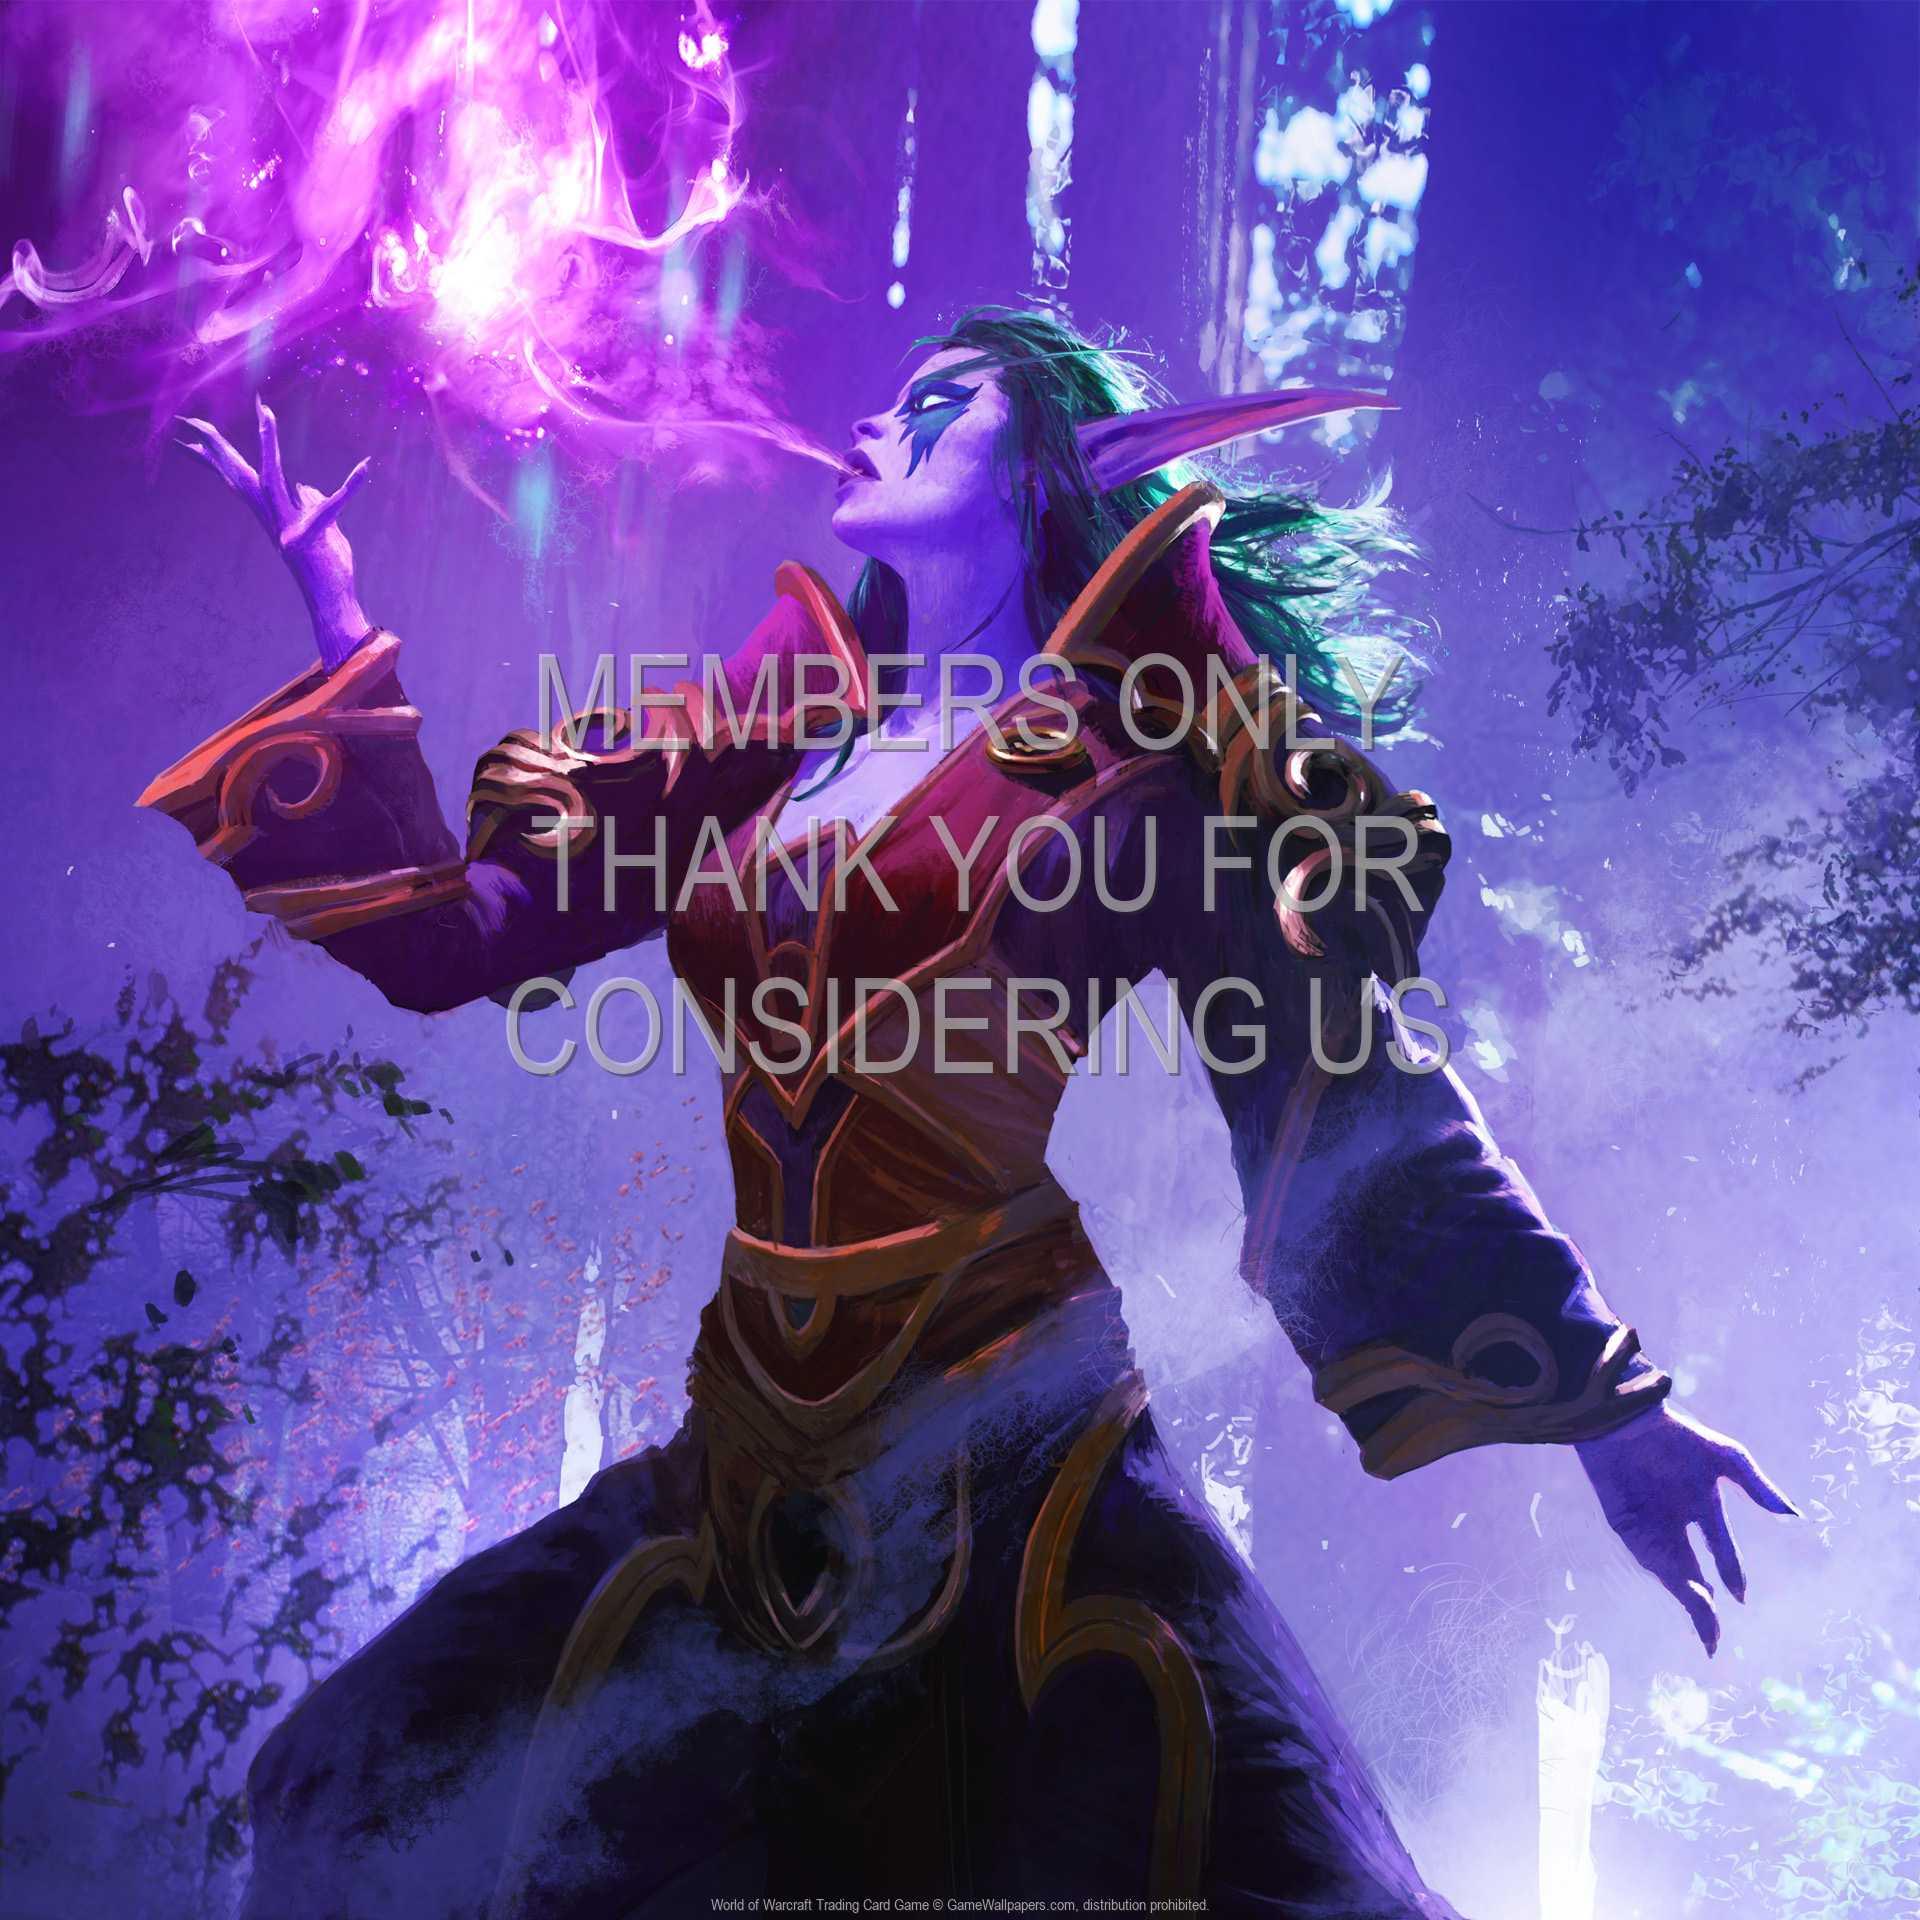 World of Warcraft: Trading Card Game 1080p Horizontal Handy Hintergrundbild 53